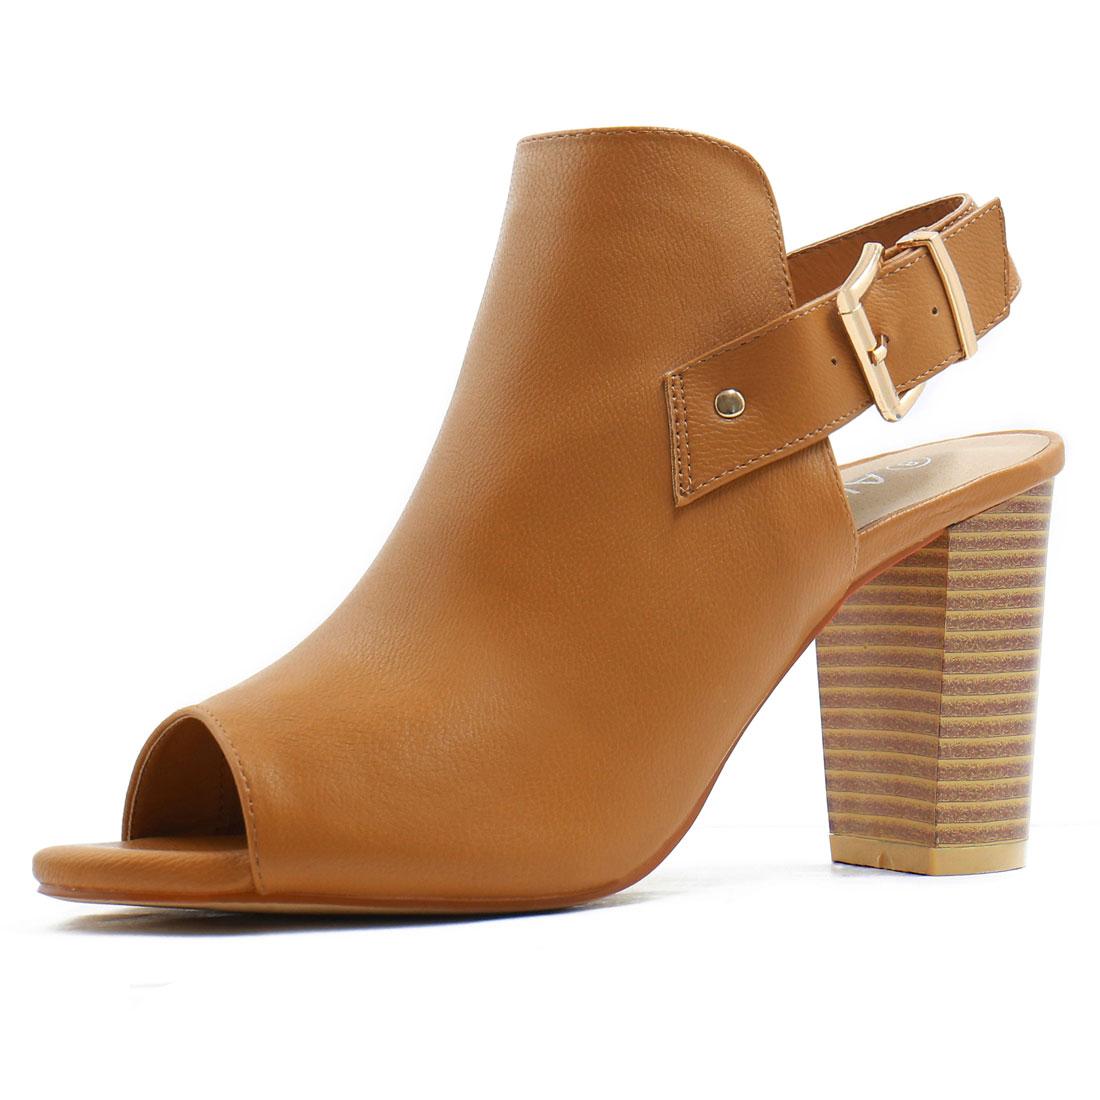 Women Peep Toe Slip On Stacked Heel Slingback Sandals Camel US 8